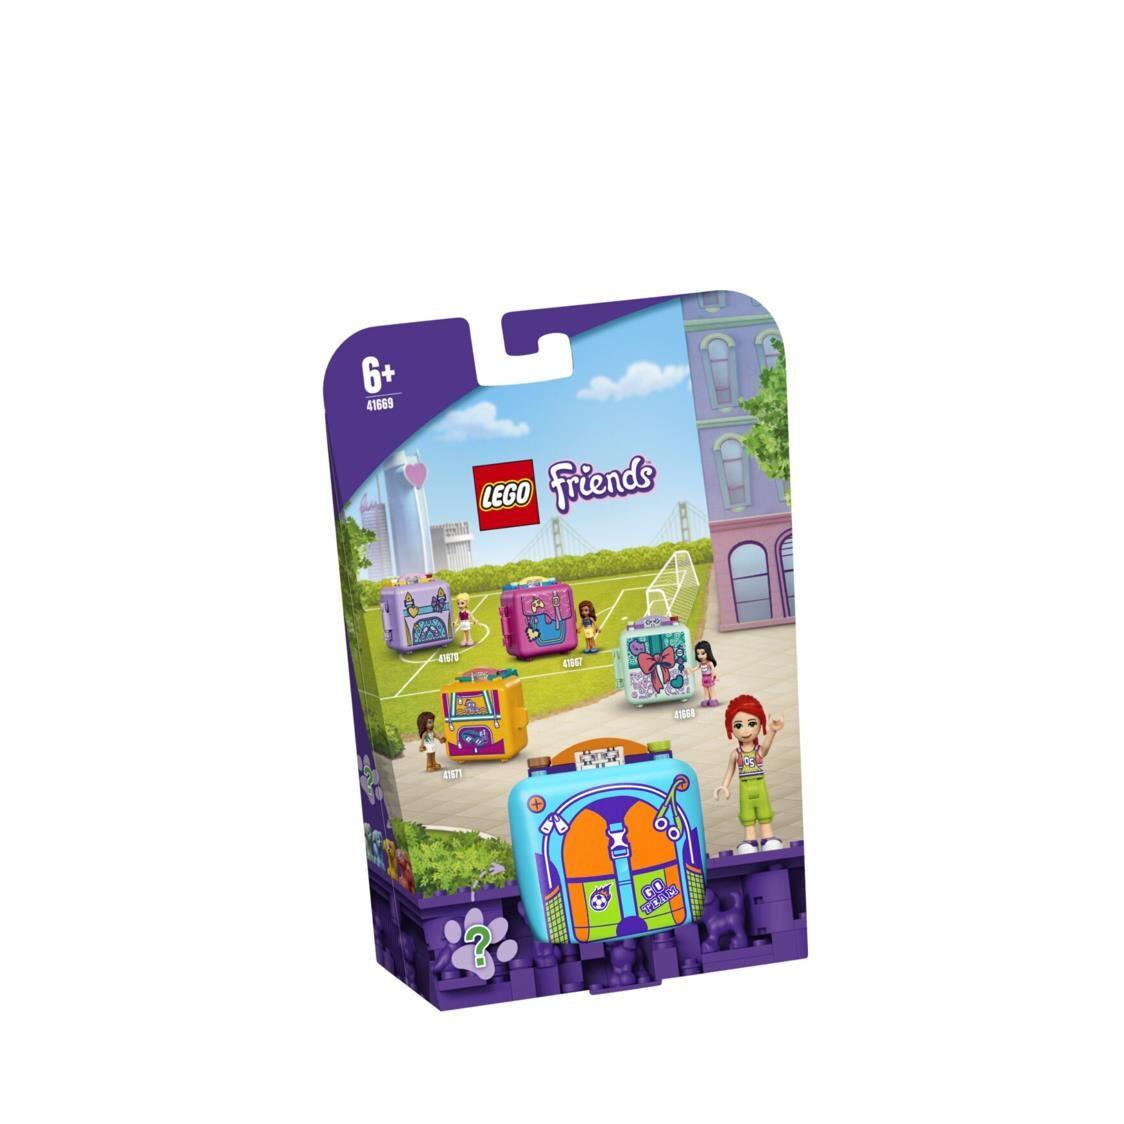 LEGO Friends - Mias Soccer Cube 41669